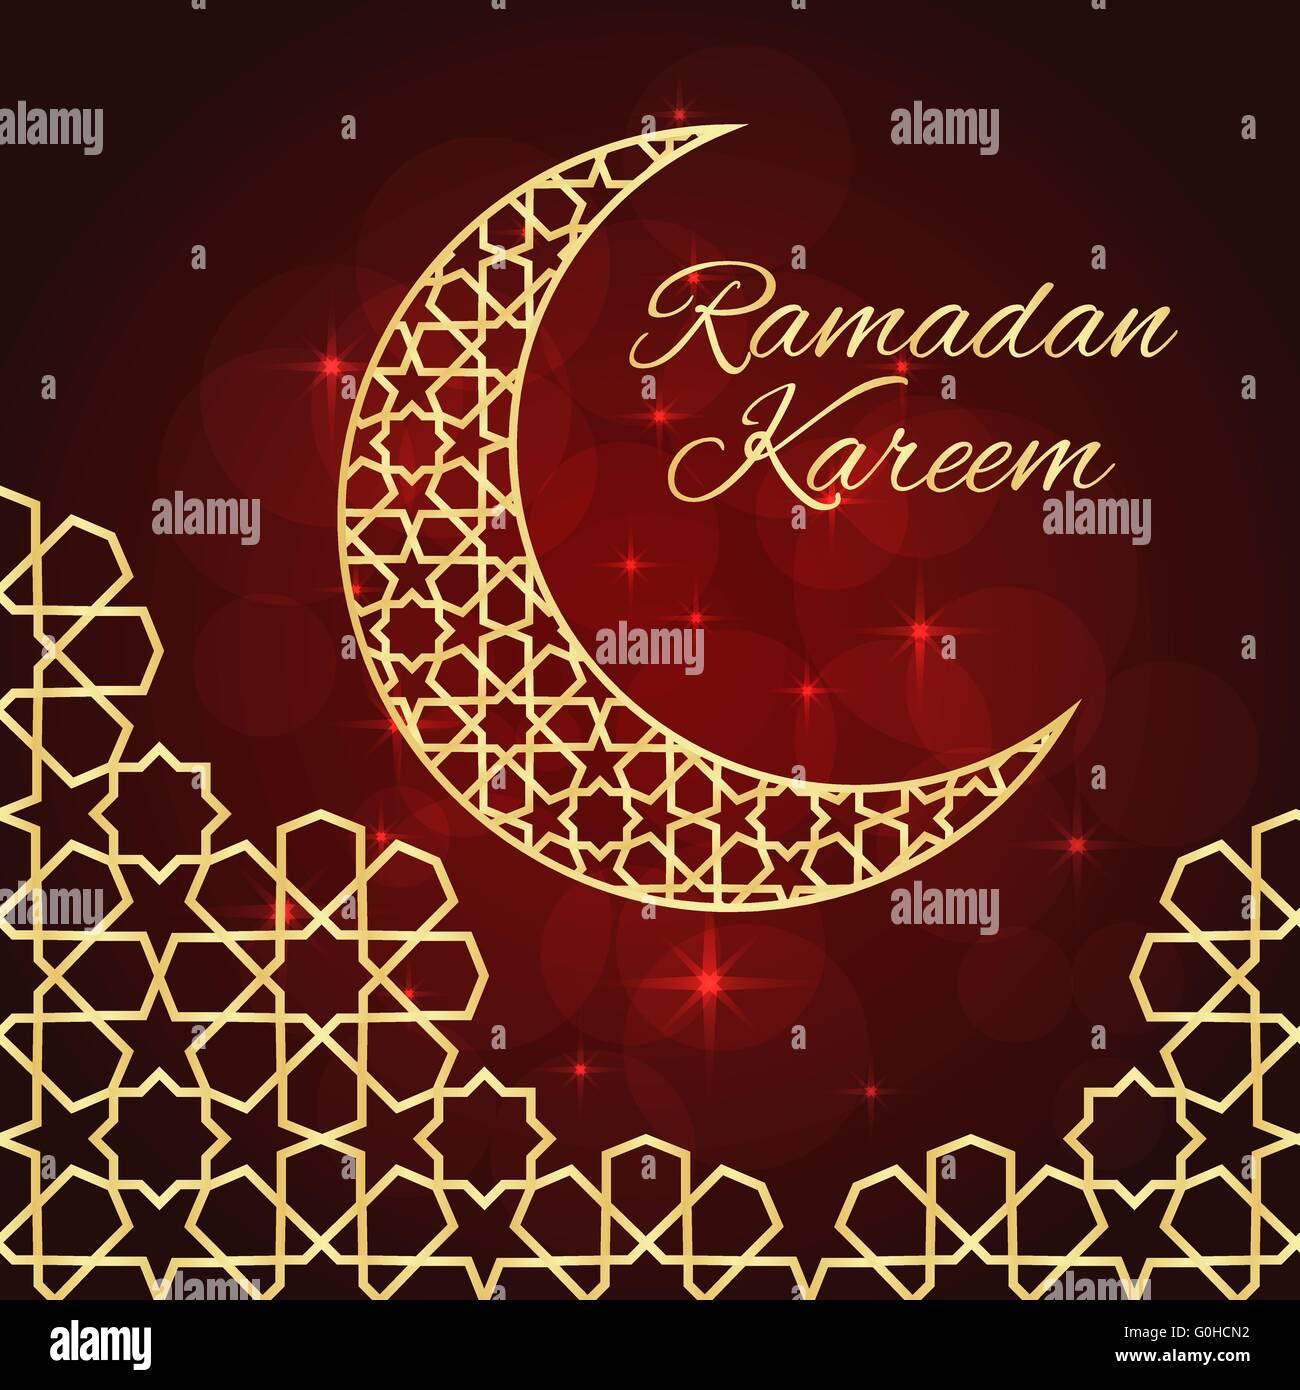 Ramadan greeting card stock vector art illustration vector image ramadan greeting card m4hsunfo Image collections